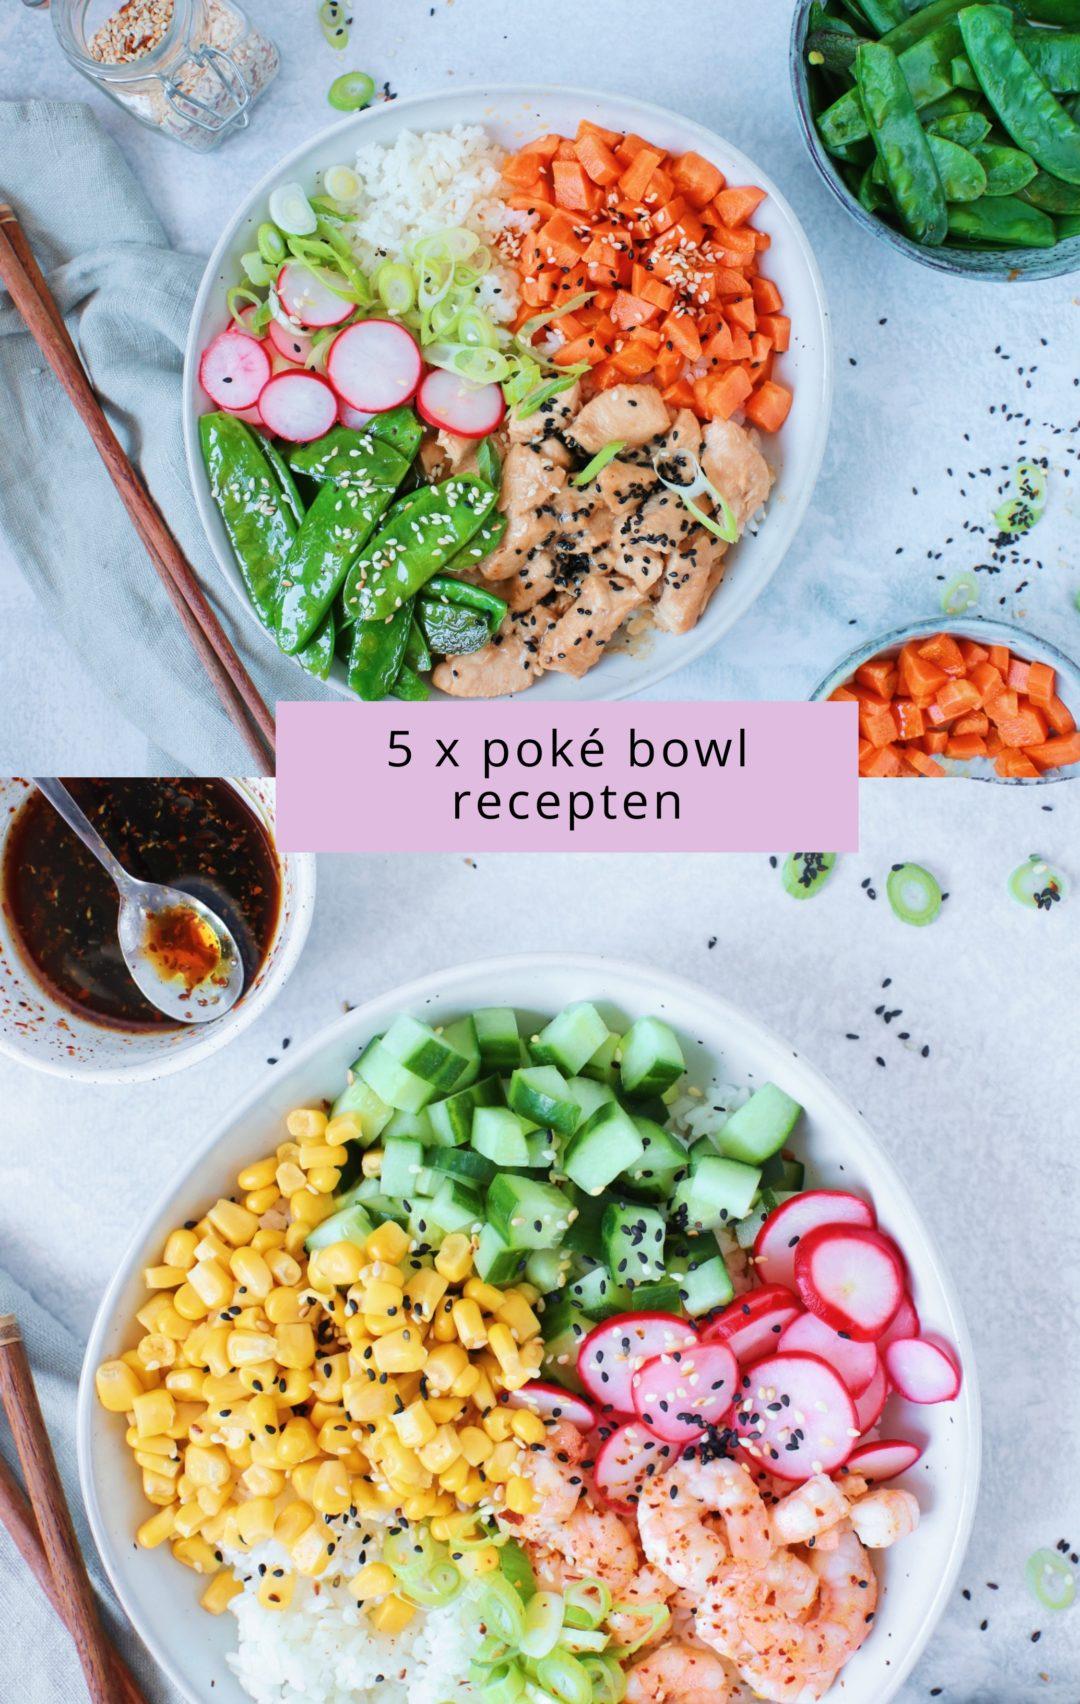 5 x poke bowl recepten www.jaimyskitchen.nl